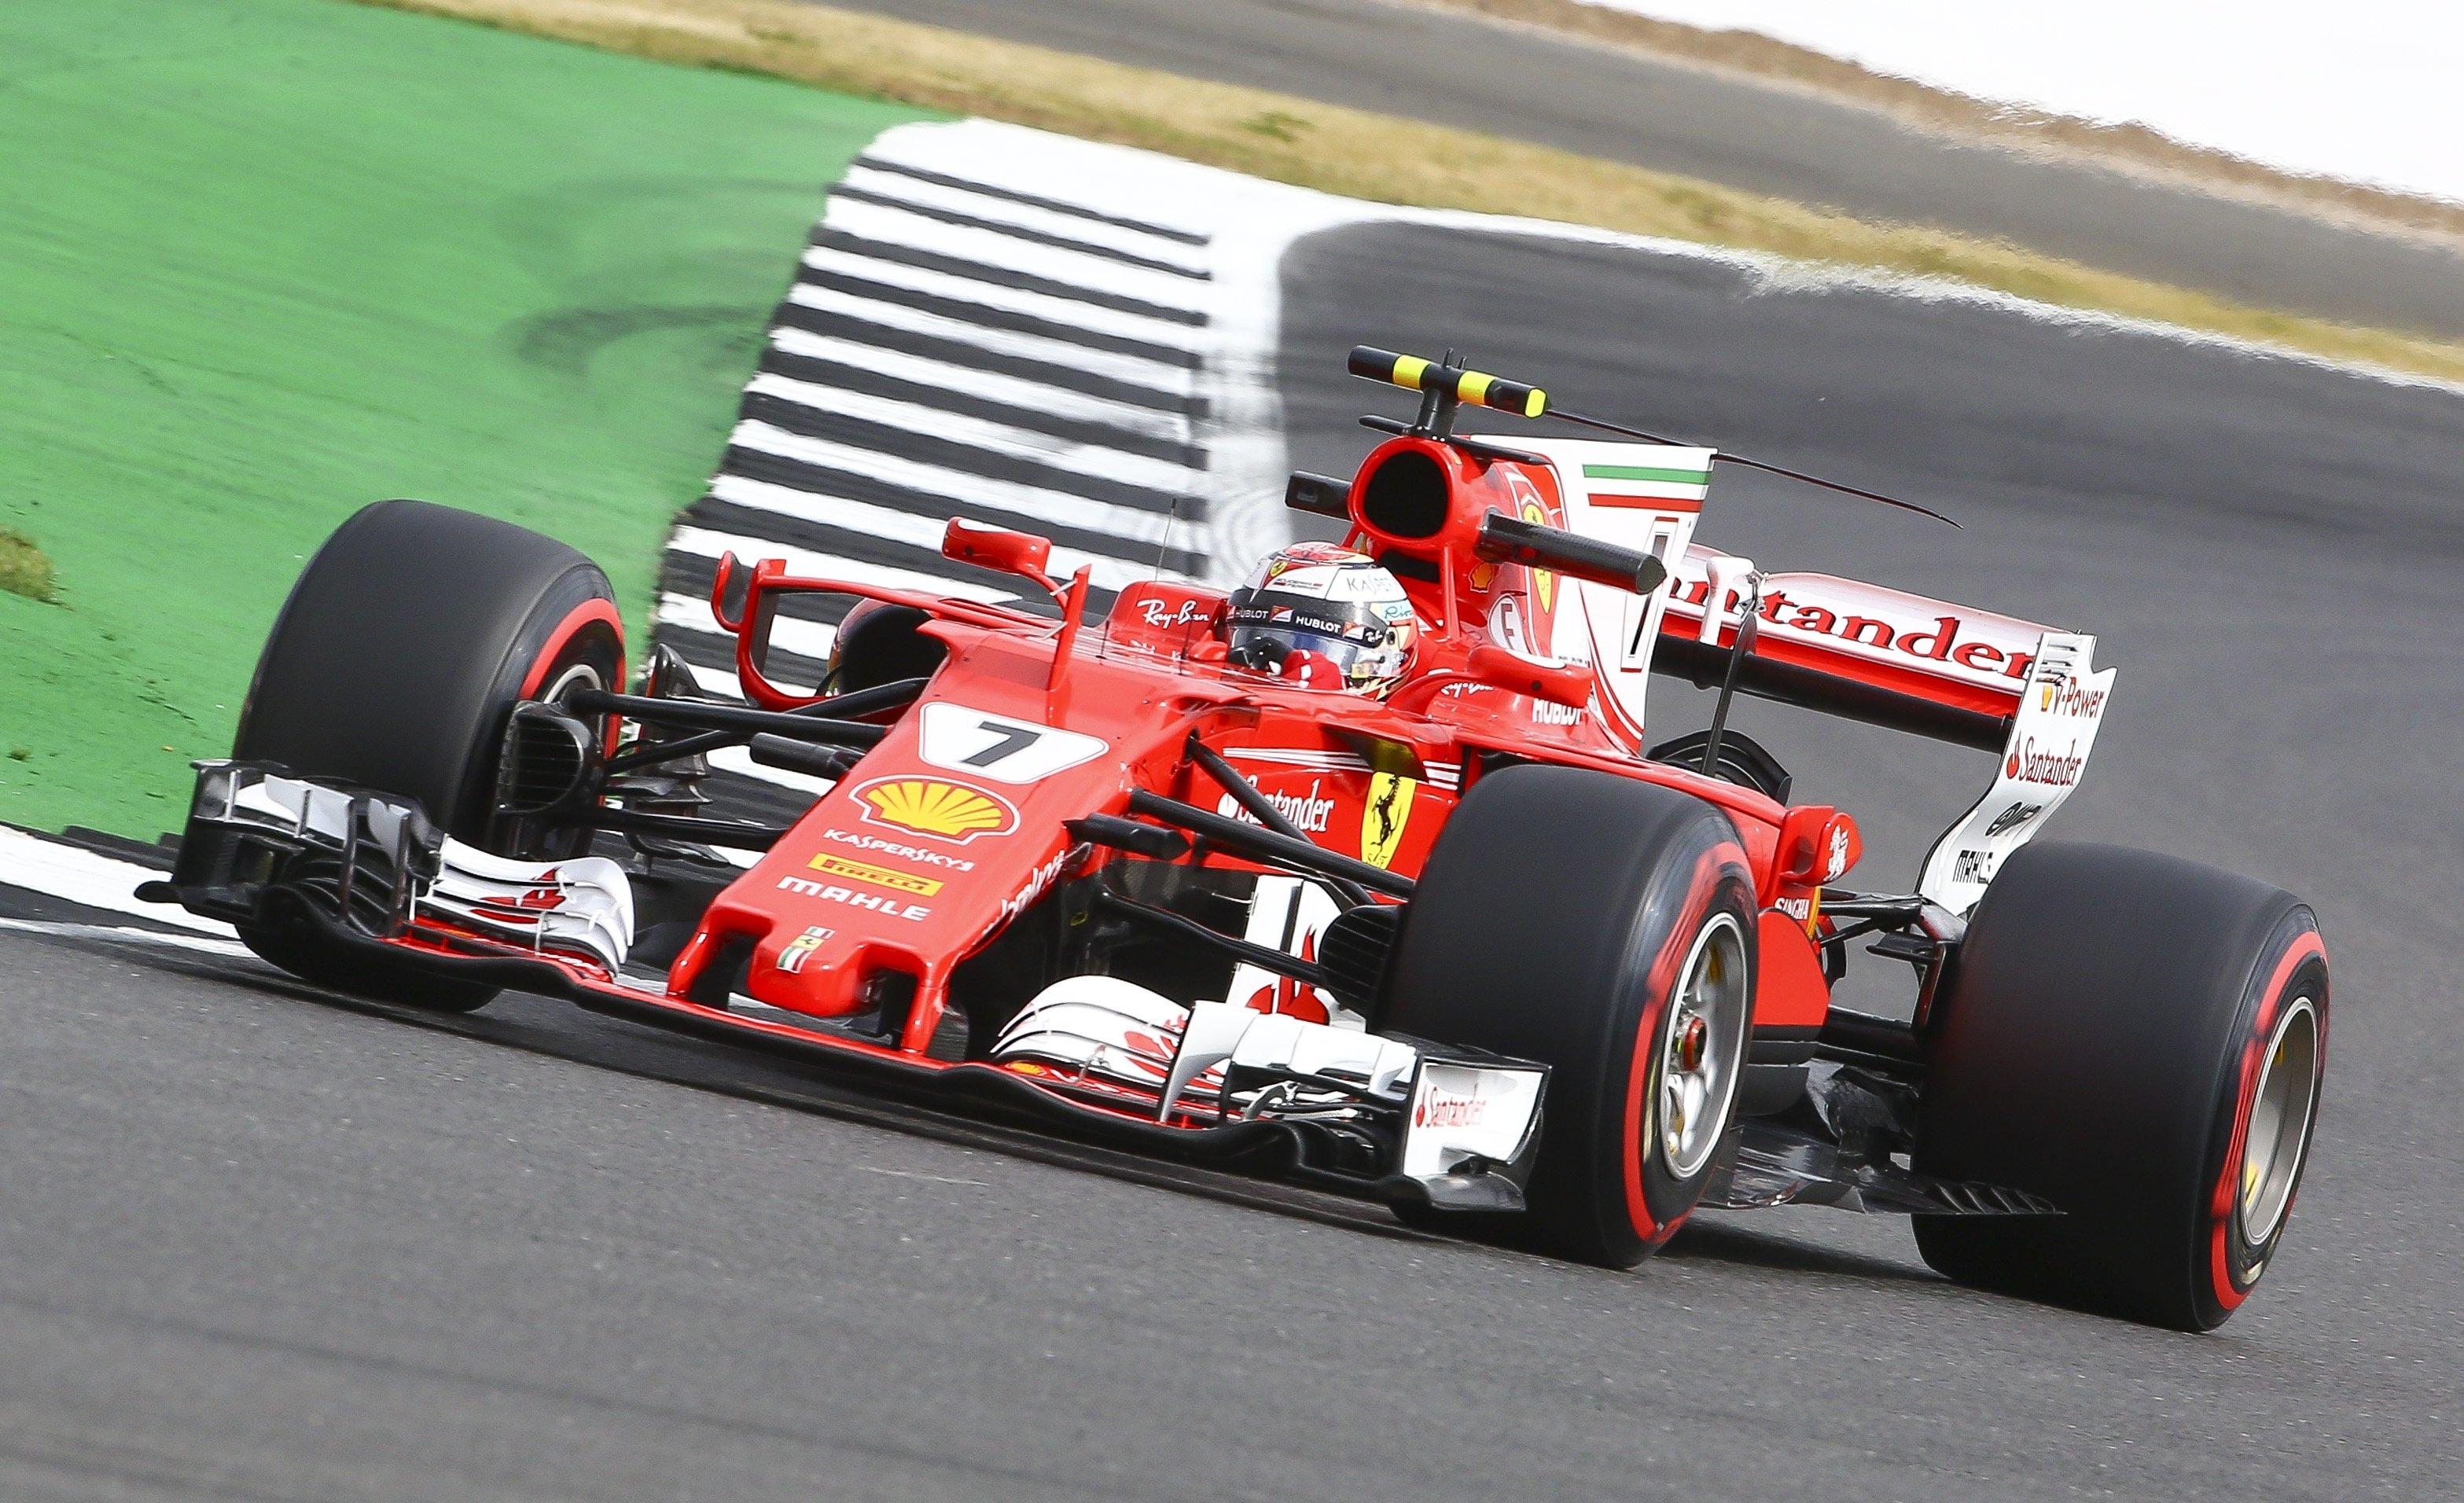 Ferrari confirma permanência de Raikkonen para a temporada de 2018